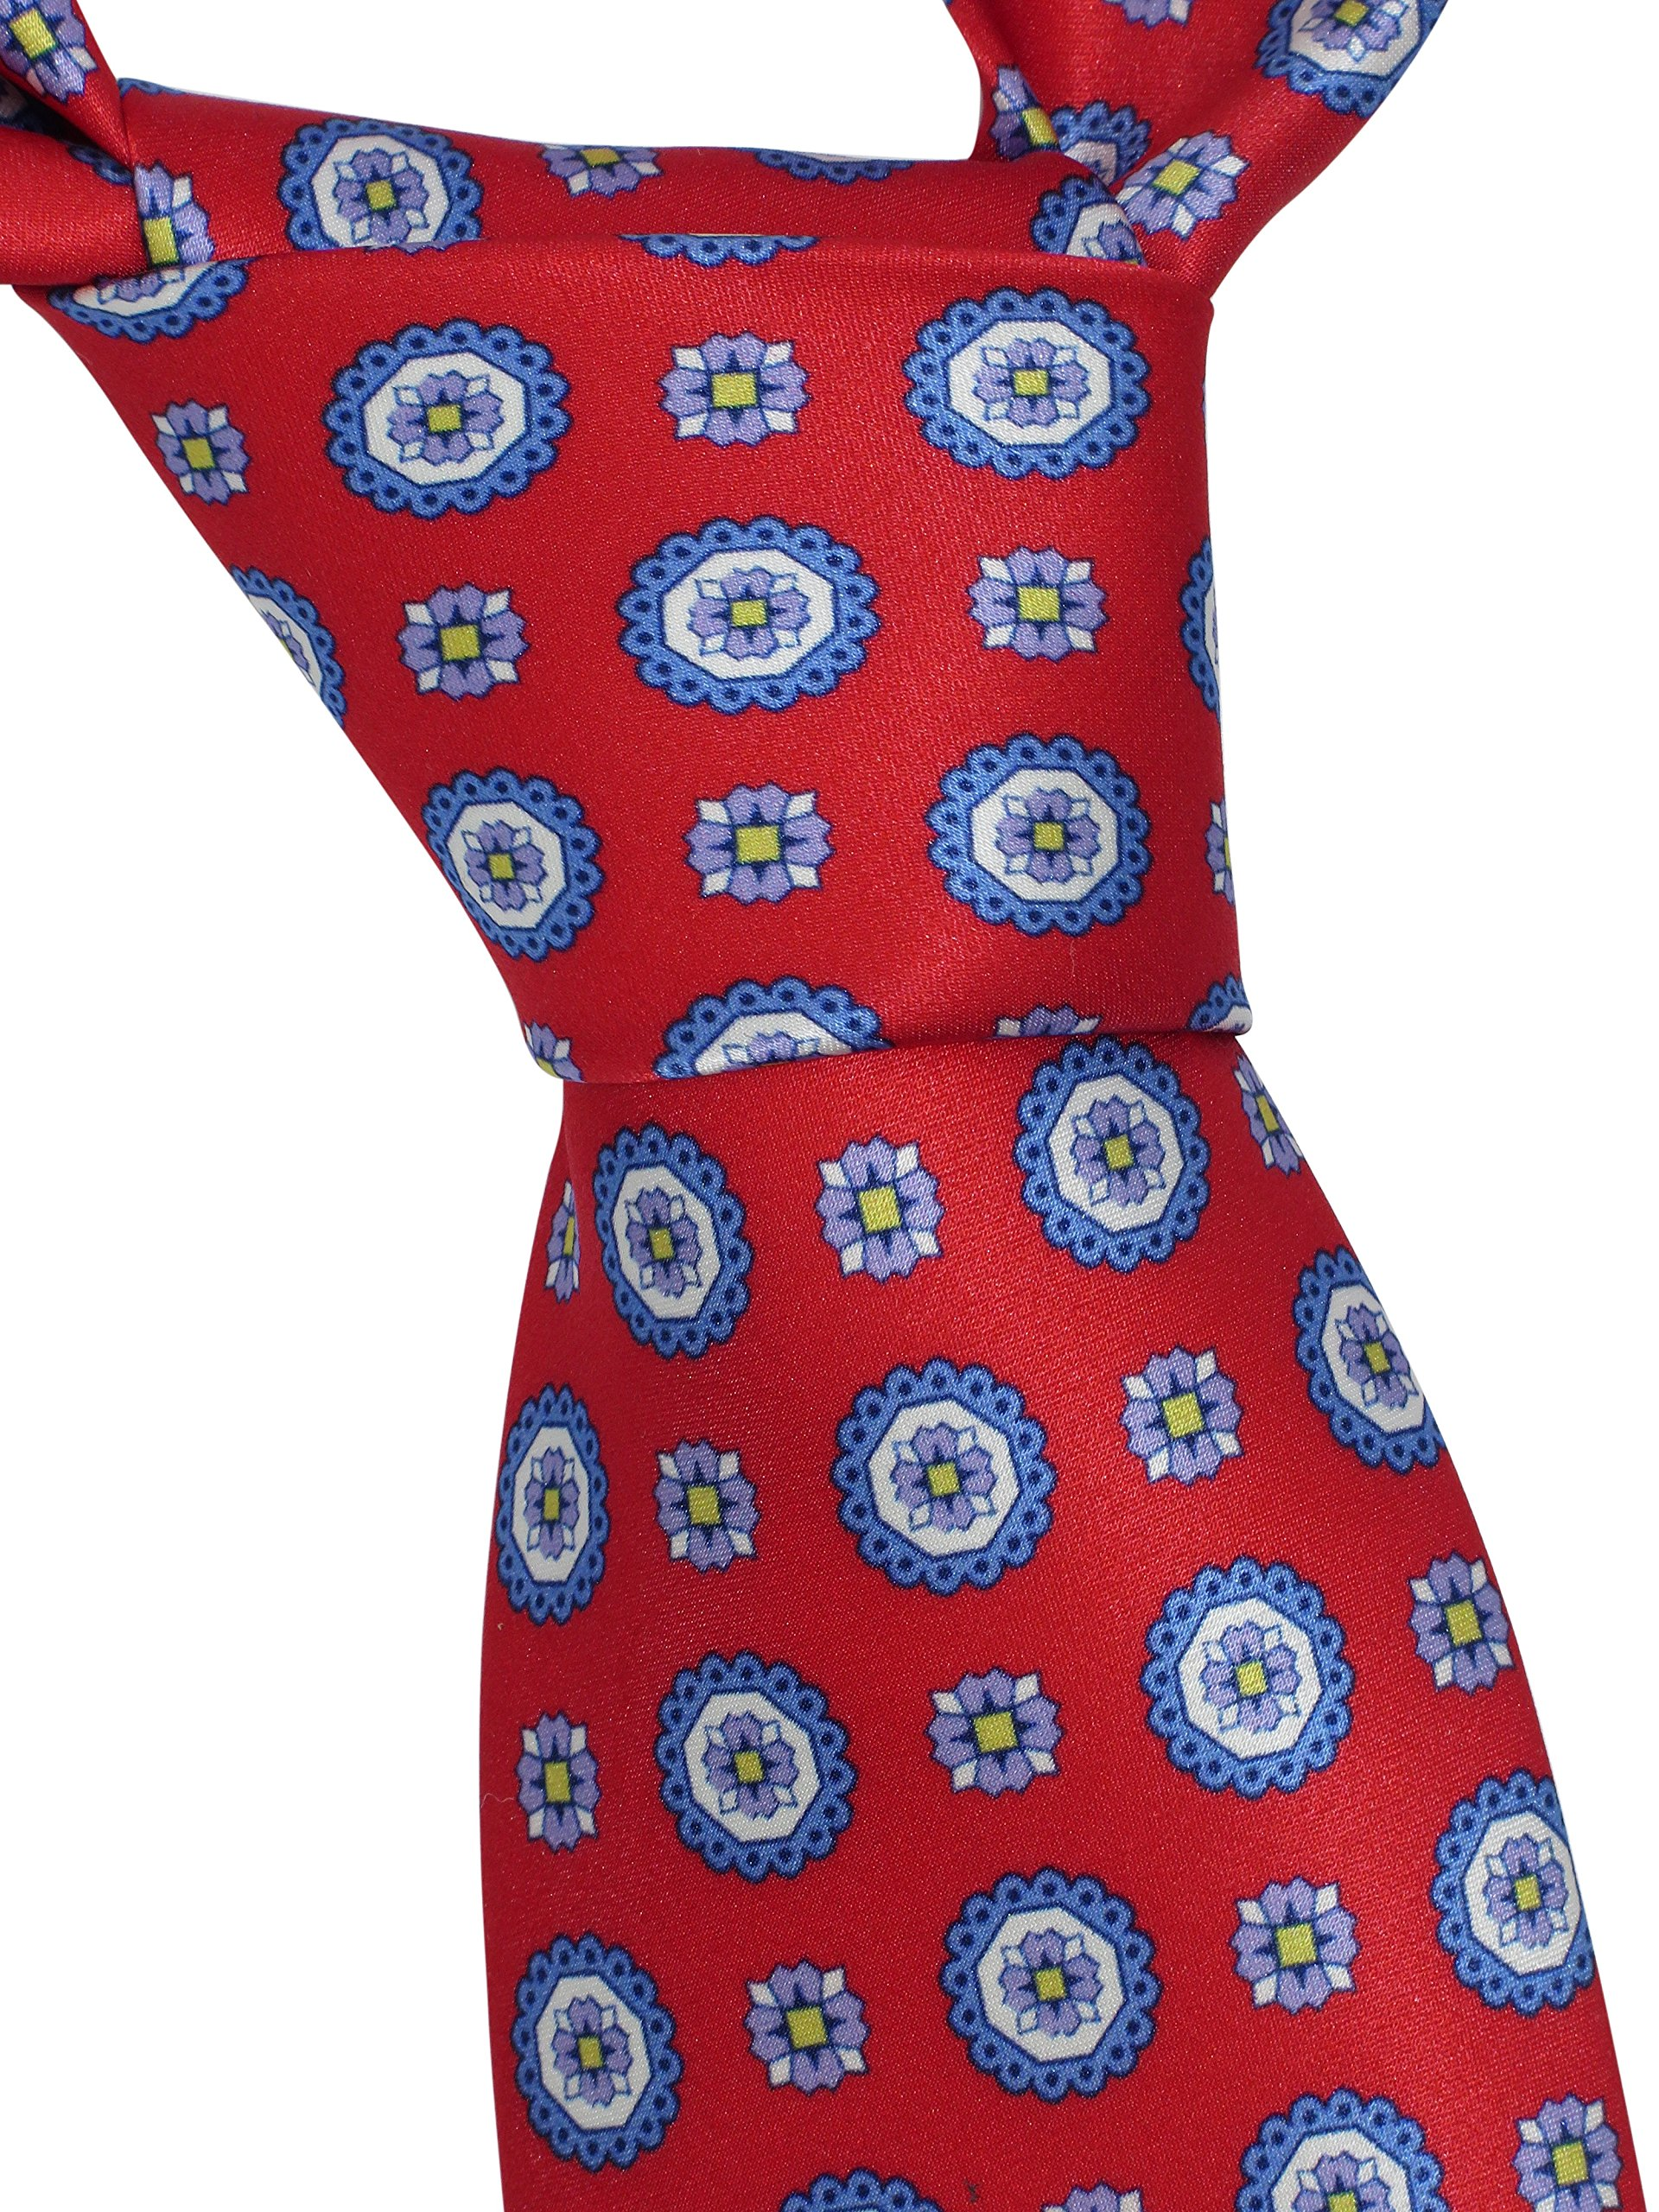 Brioni Men's Red Floral 100% Silk Skinny Neck Tie by Brioni